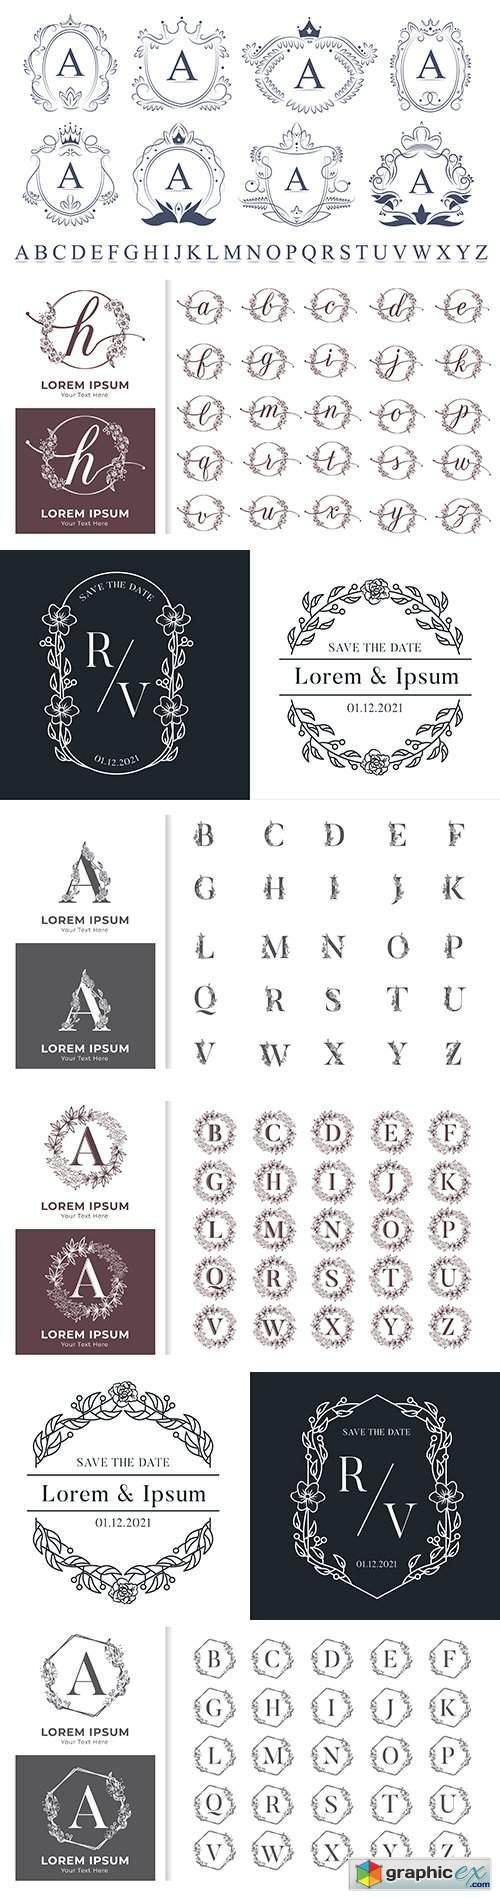 Decorative luxury monogram alphabet with floral frames